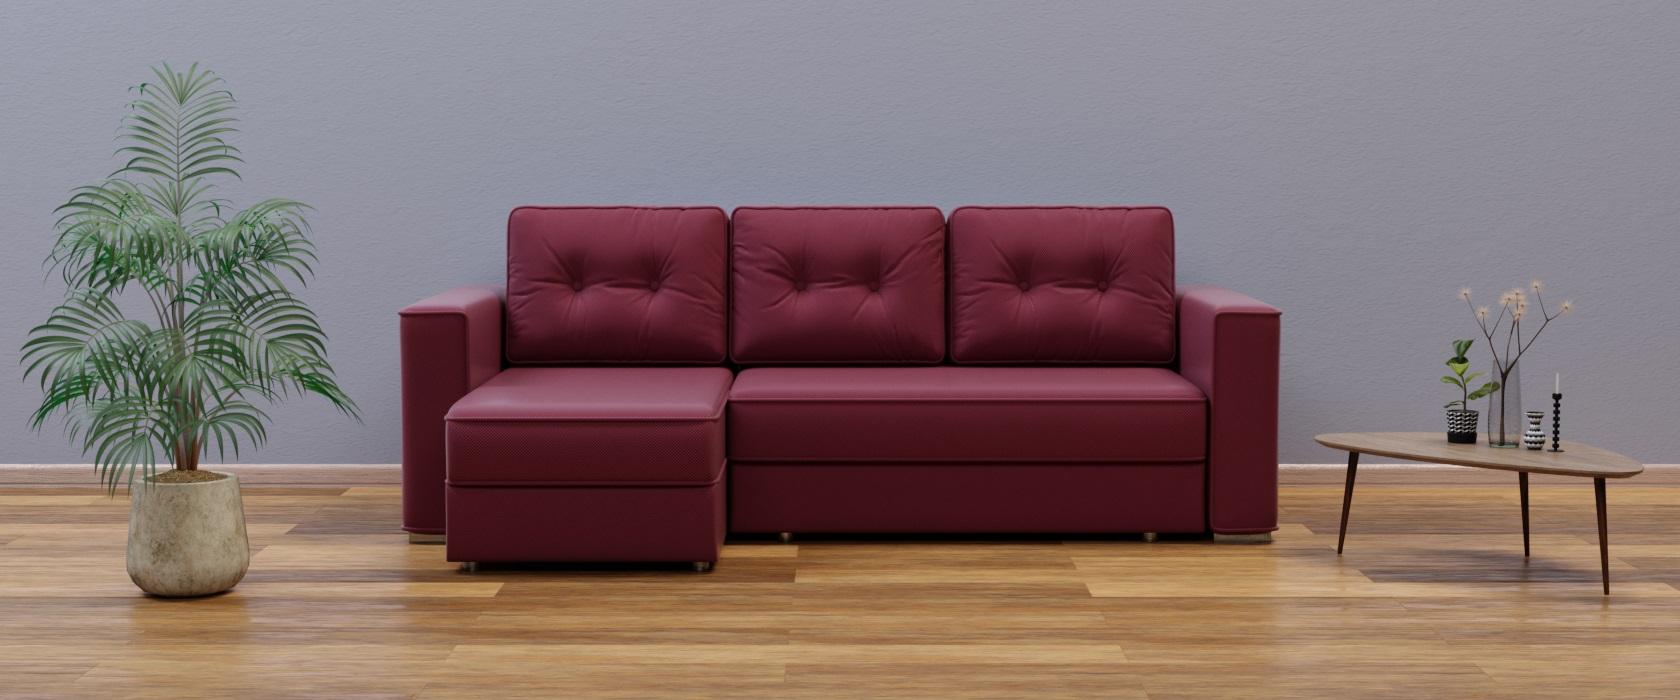 Кутовий диван Silvio - Фото 2 - Pufetto